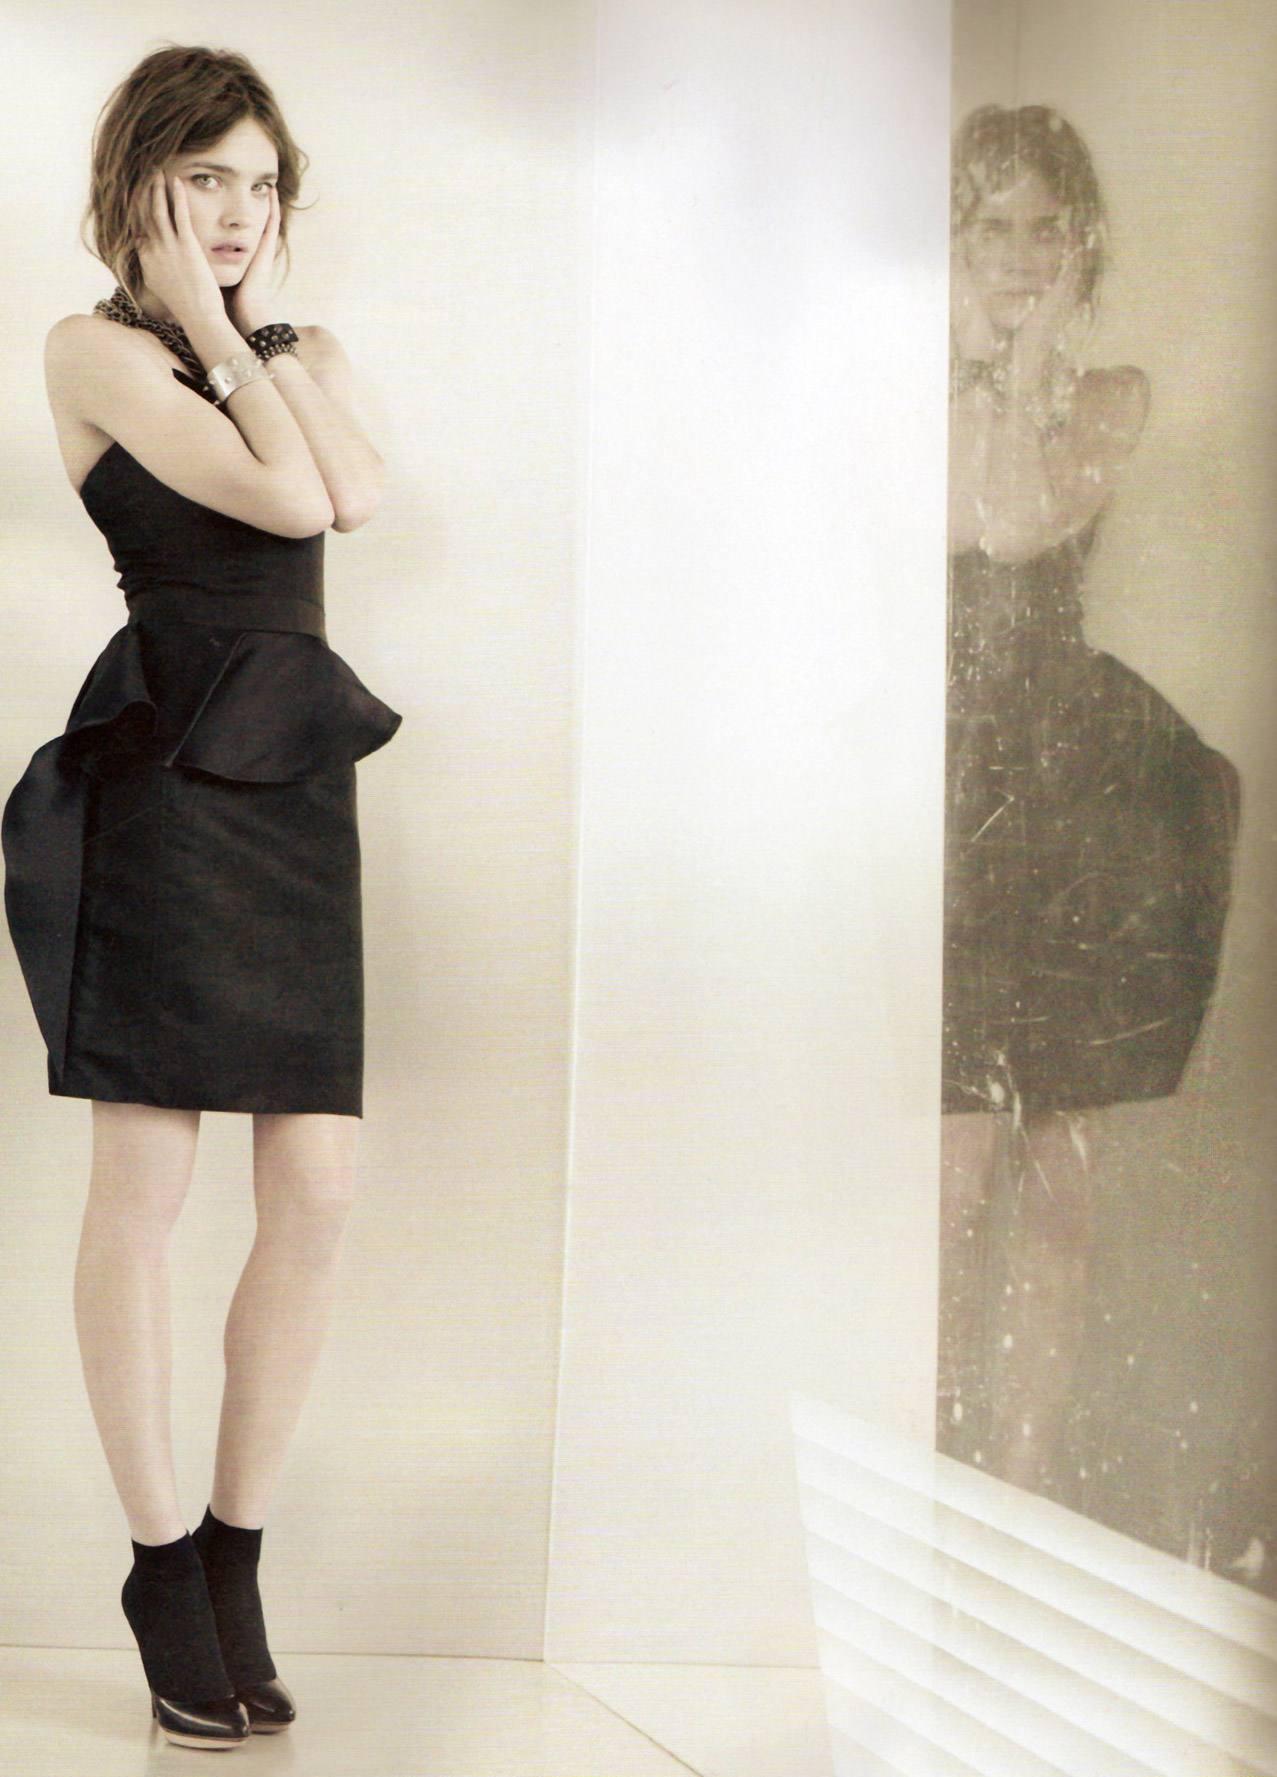 Наталья Водянова, фотограф Паоло Роверси / Natalia Vodianova by Paolo Roversi